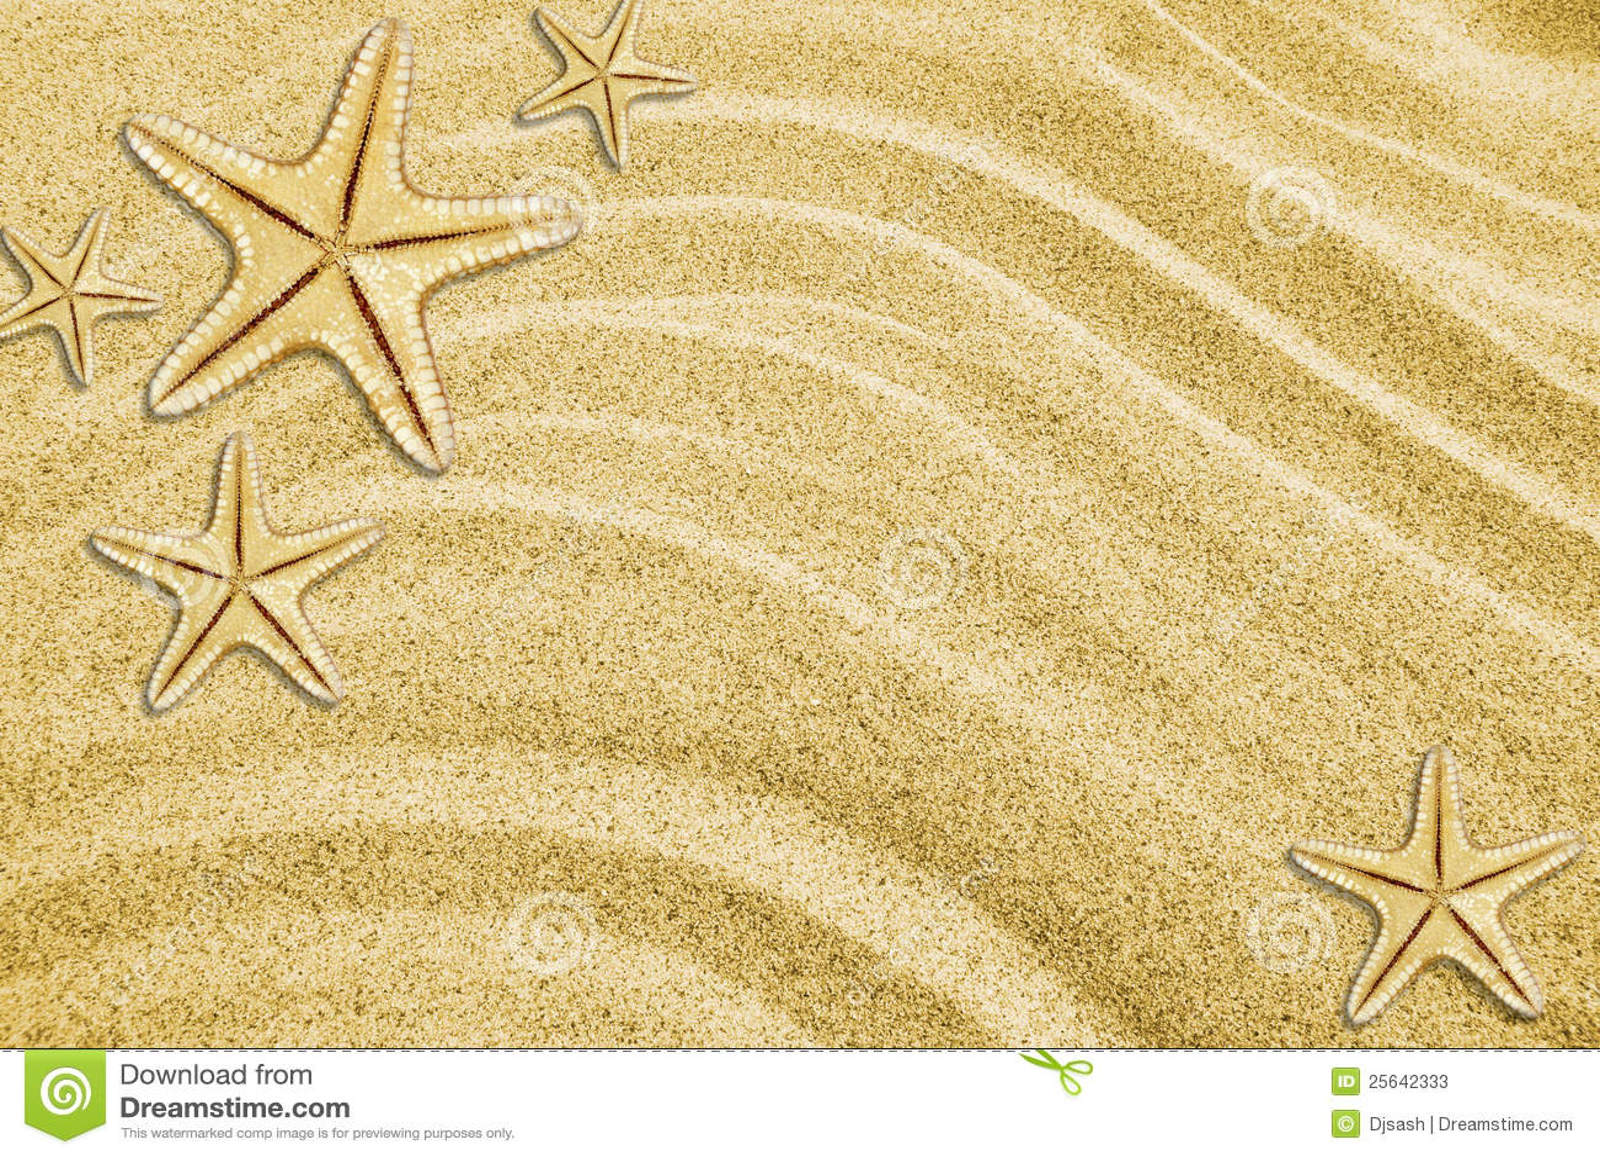 Starfishes on beach sand